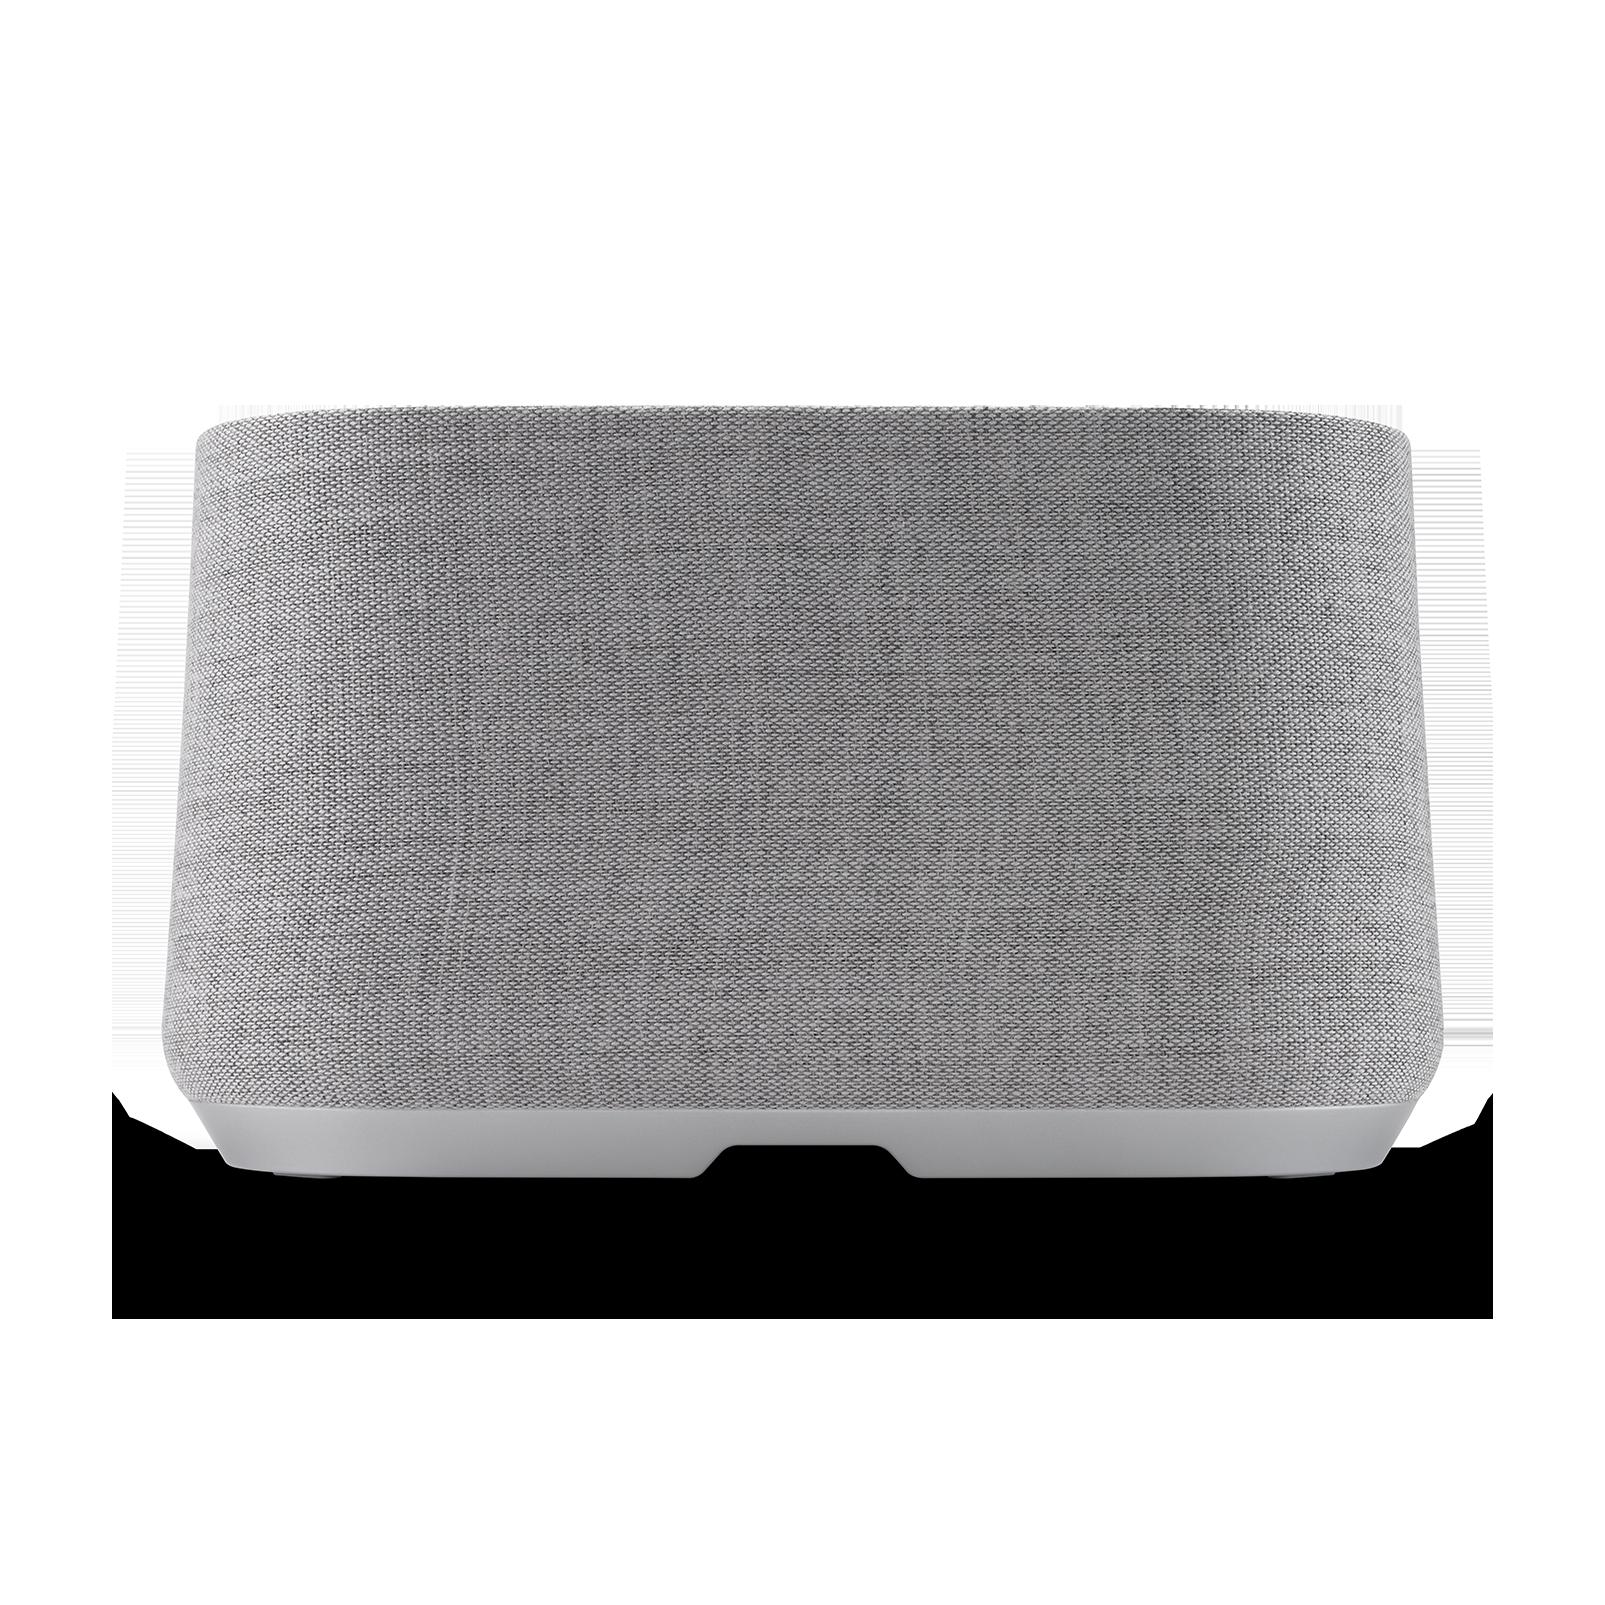 Harman Kardon Citation 300 - Grey - The medium-size smart home speaker with award winning design - Back